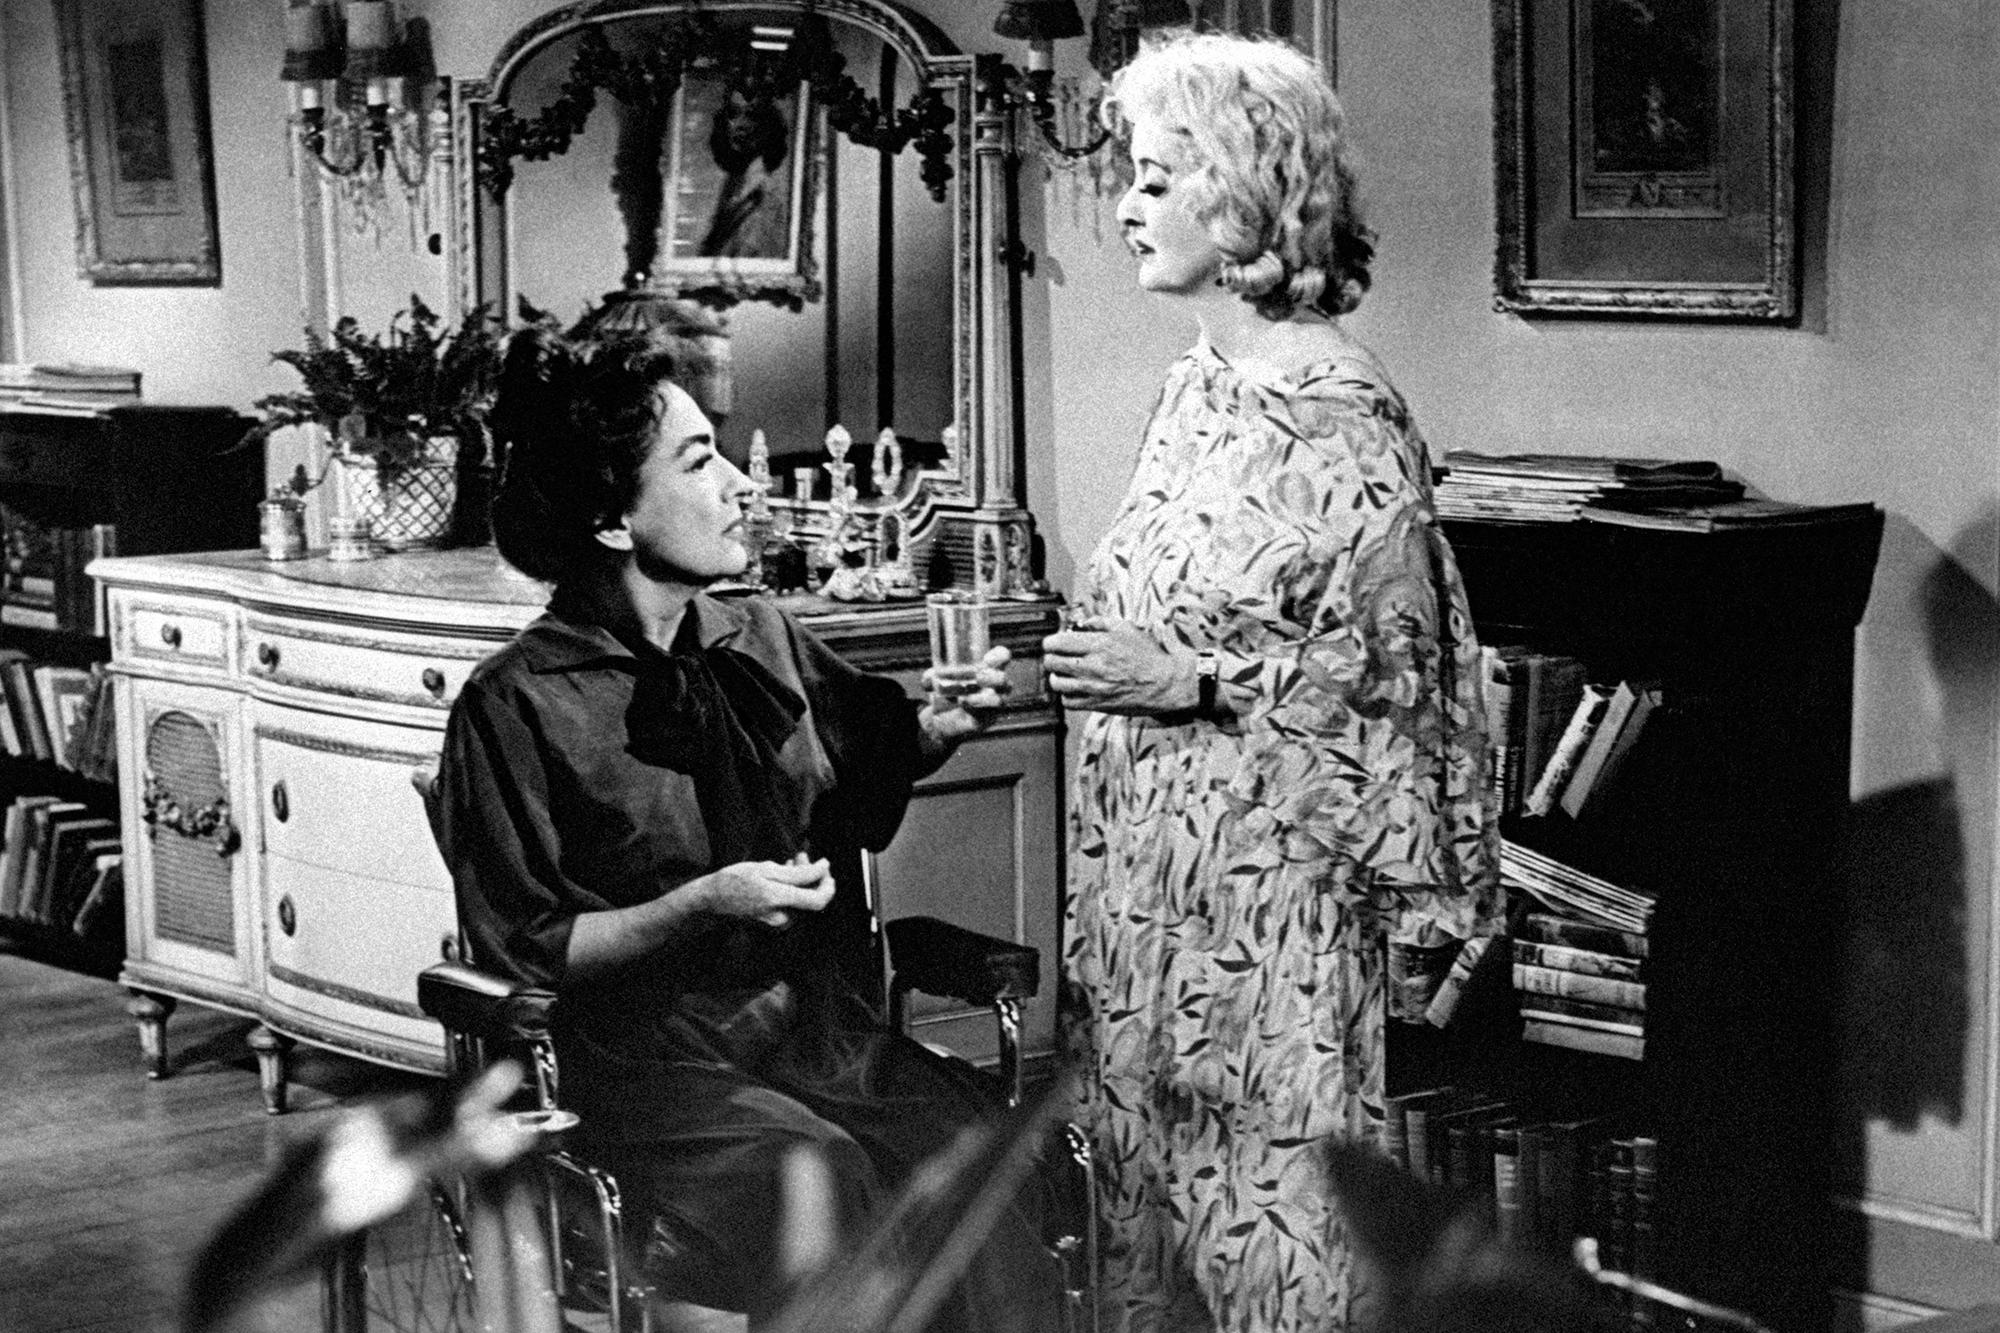 Joan Crawford and Bette Davis chatting